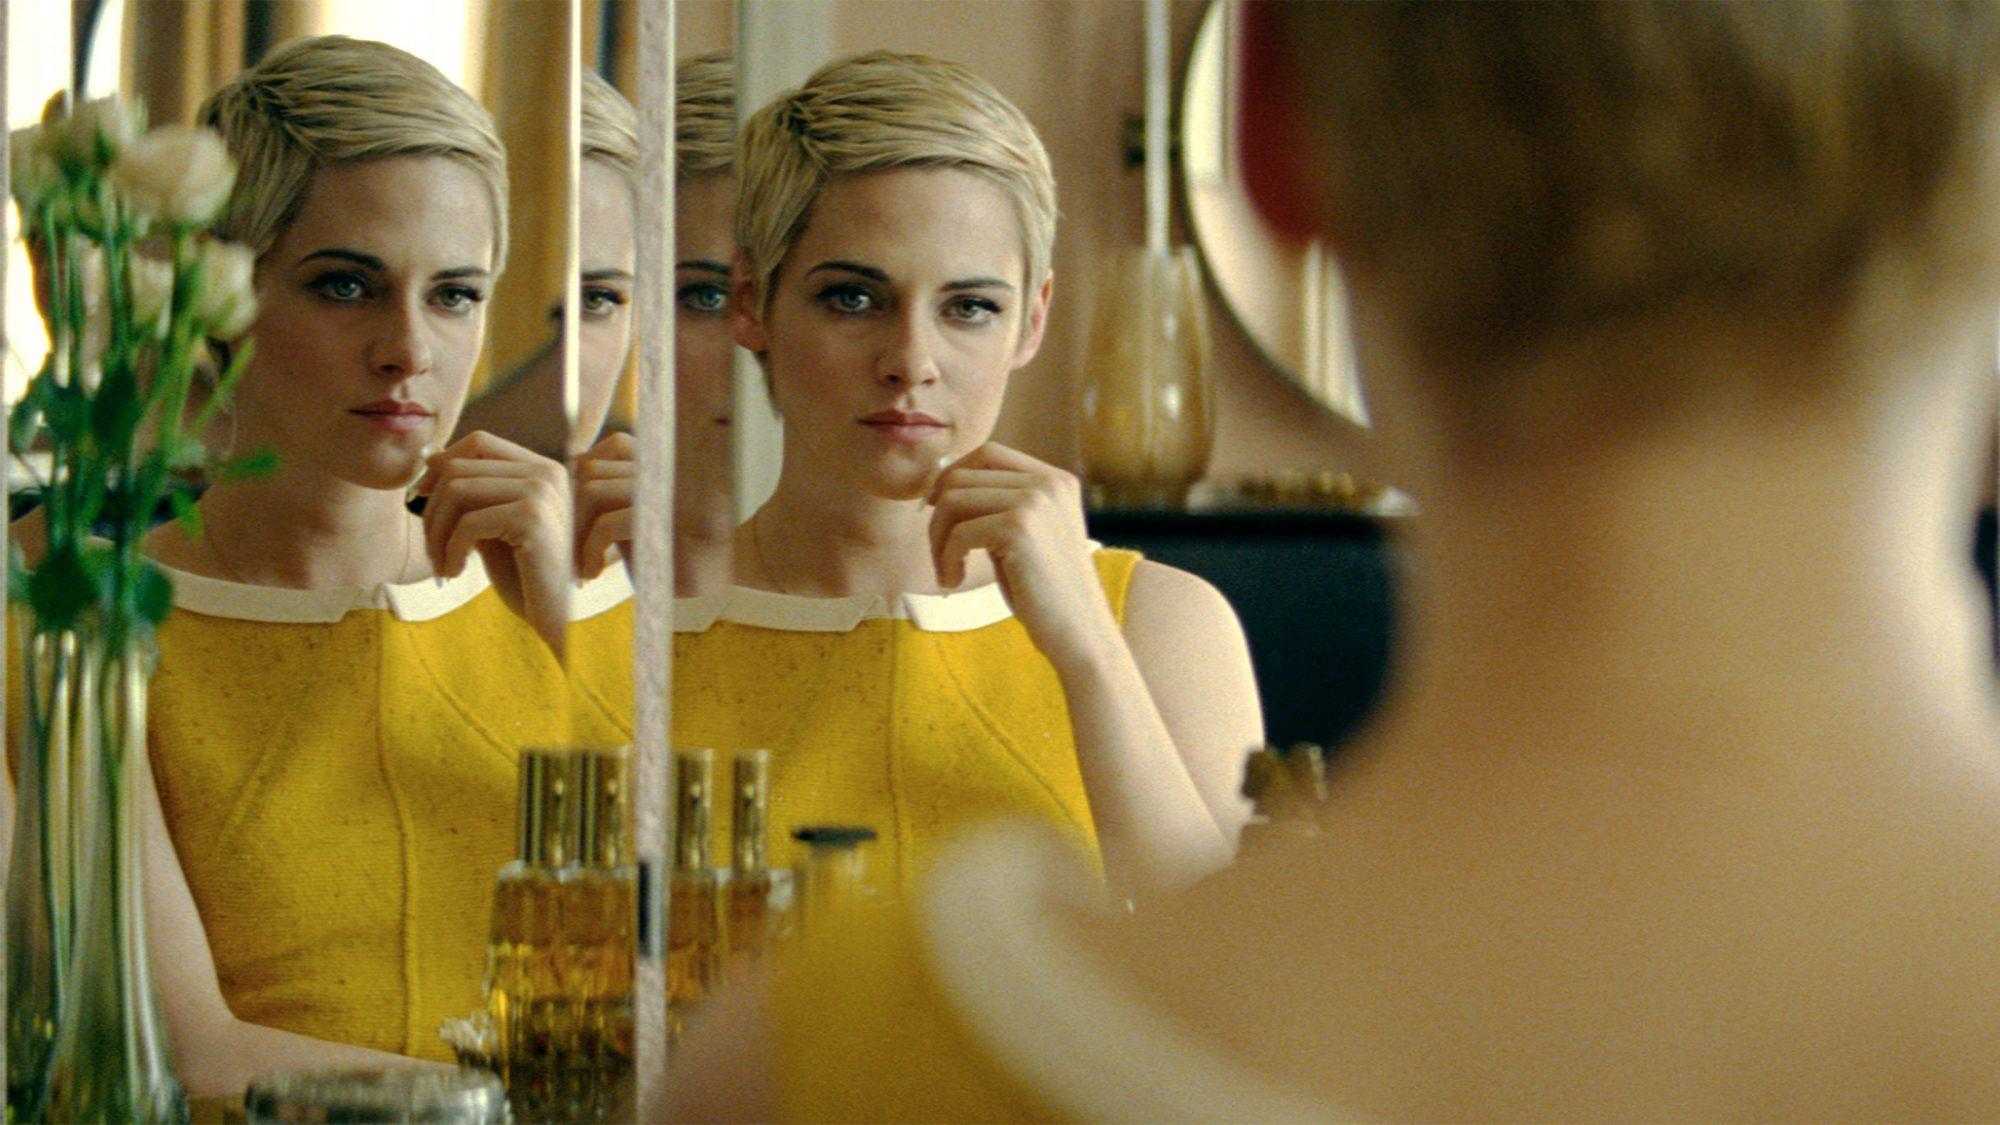 Seberg Kristen Stewart CR: Amazon Studios